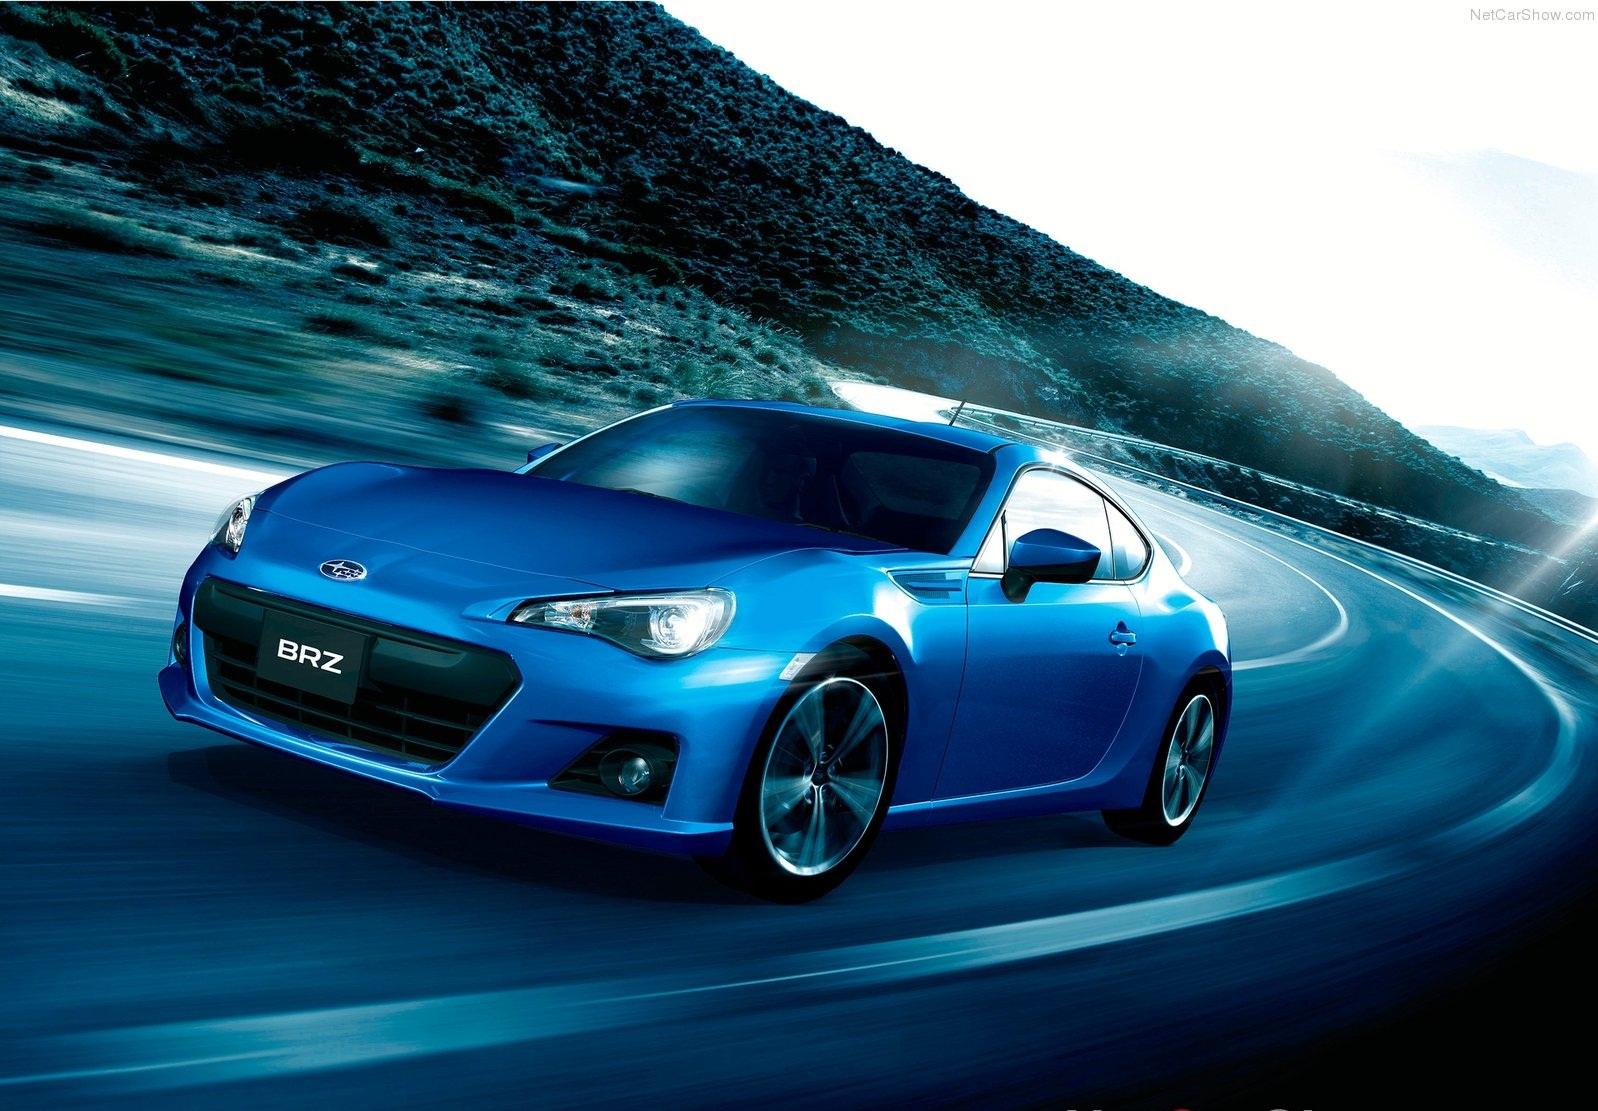 http://2.bp.blogspot.com/-39Y0DCqDiVY/Tyw6oi4ZbWI/AAAAAAAACRI/hPaxhfqqpJE/s1600/Subaru-BRZ_2013_1600x1200_wallpaper_01.jpg